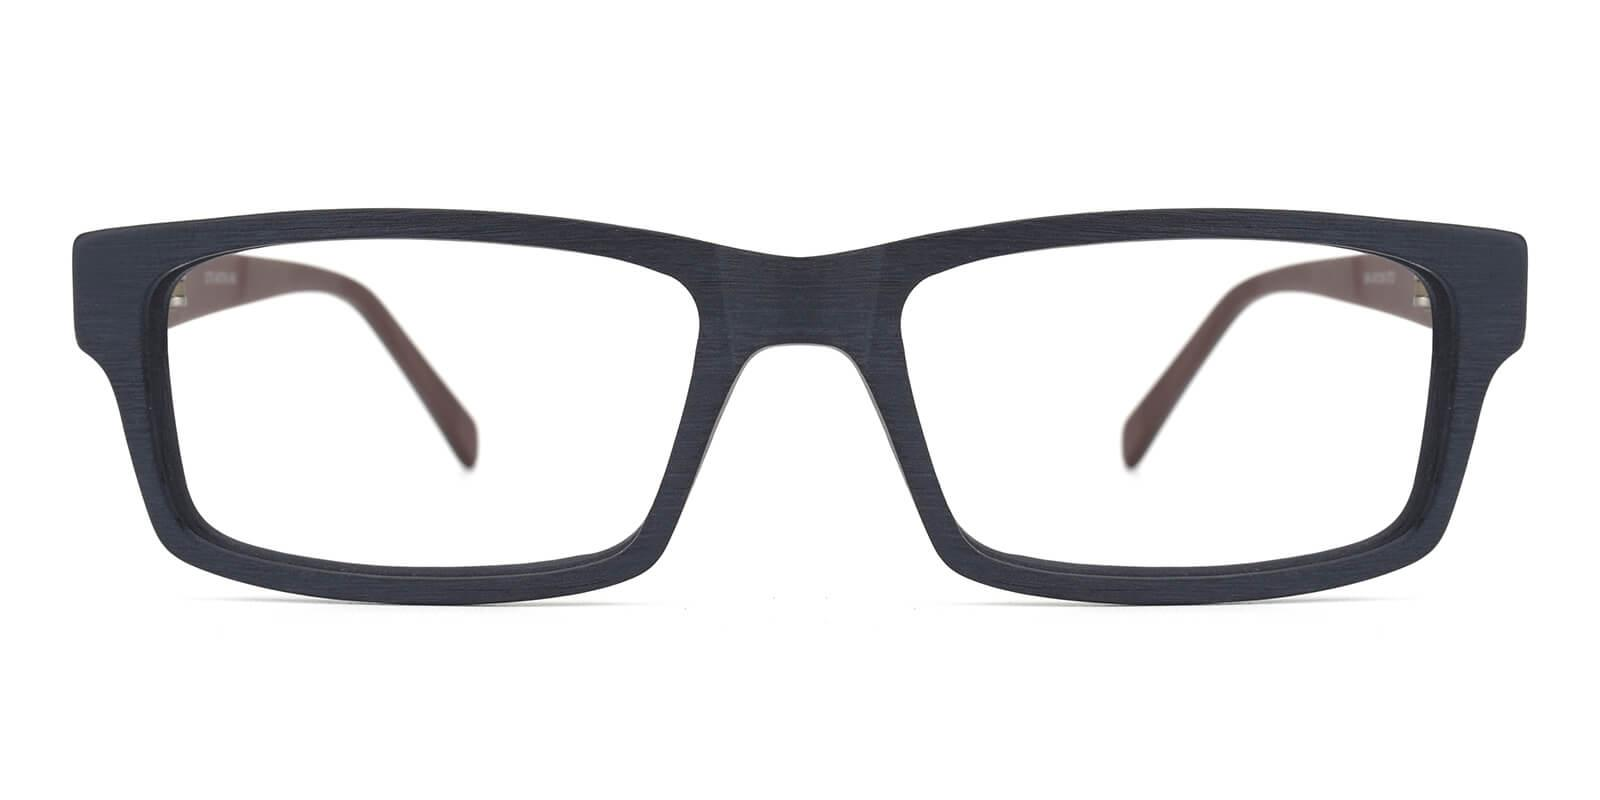 Nadien-Brown-Rectangle-Acetate-Eyeglasses-additional2